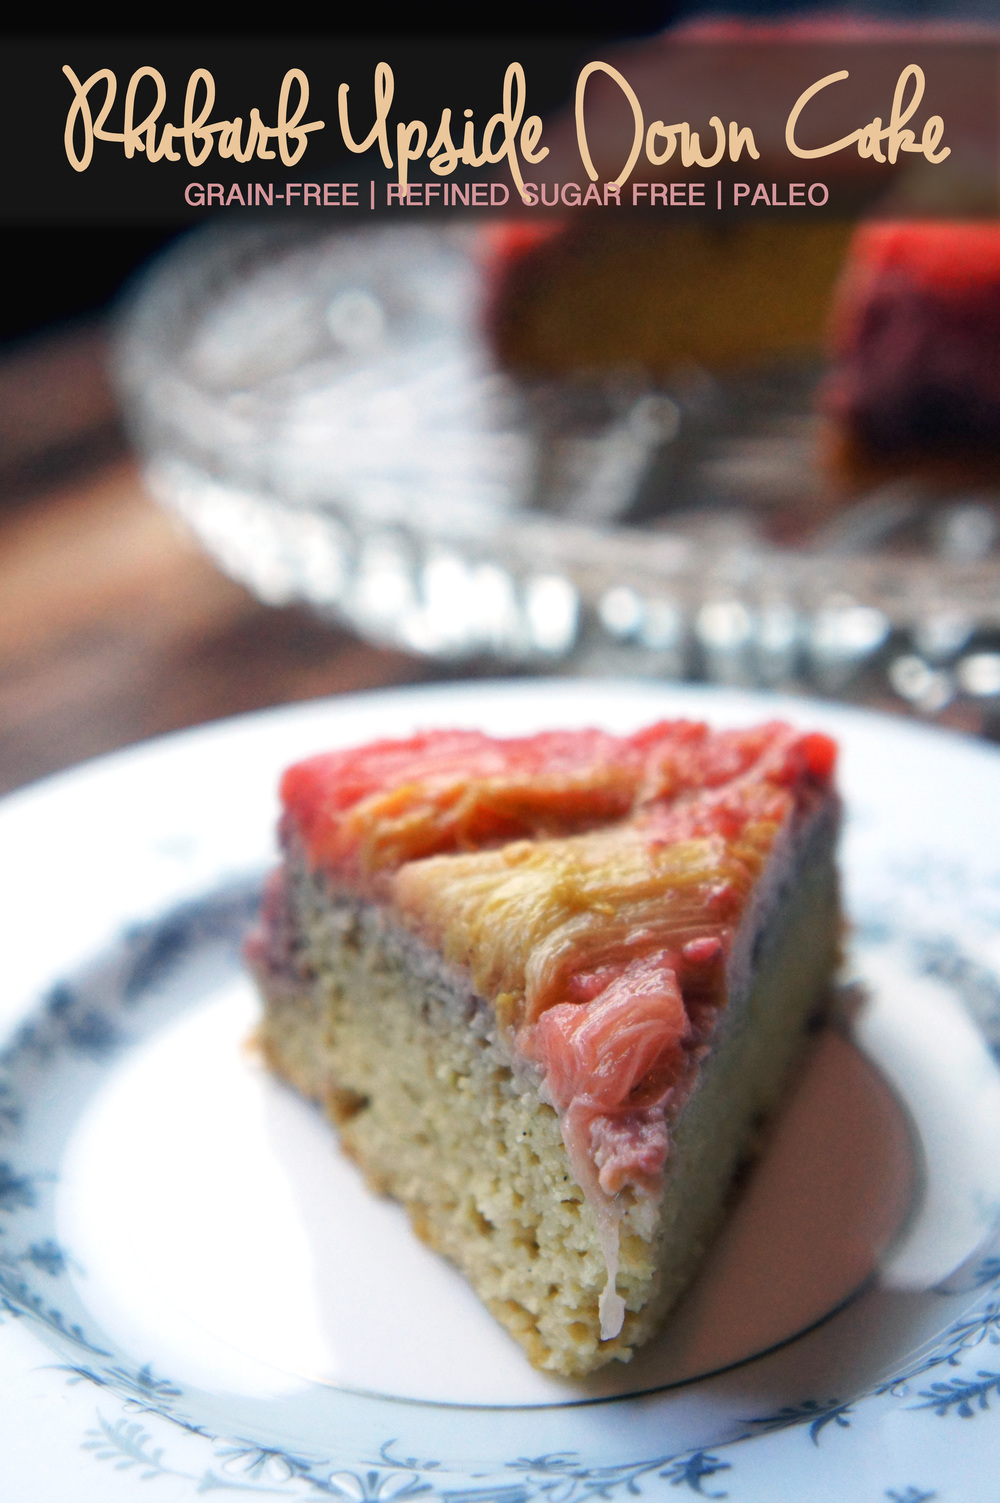 Paleo Rhubarb Upside Down Cake